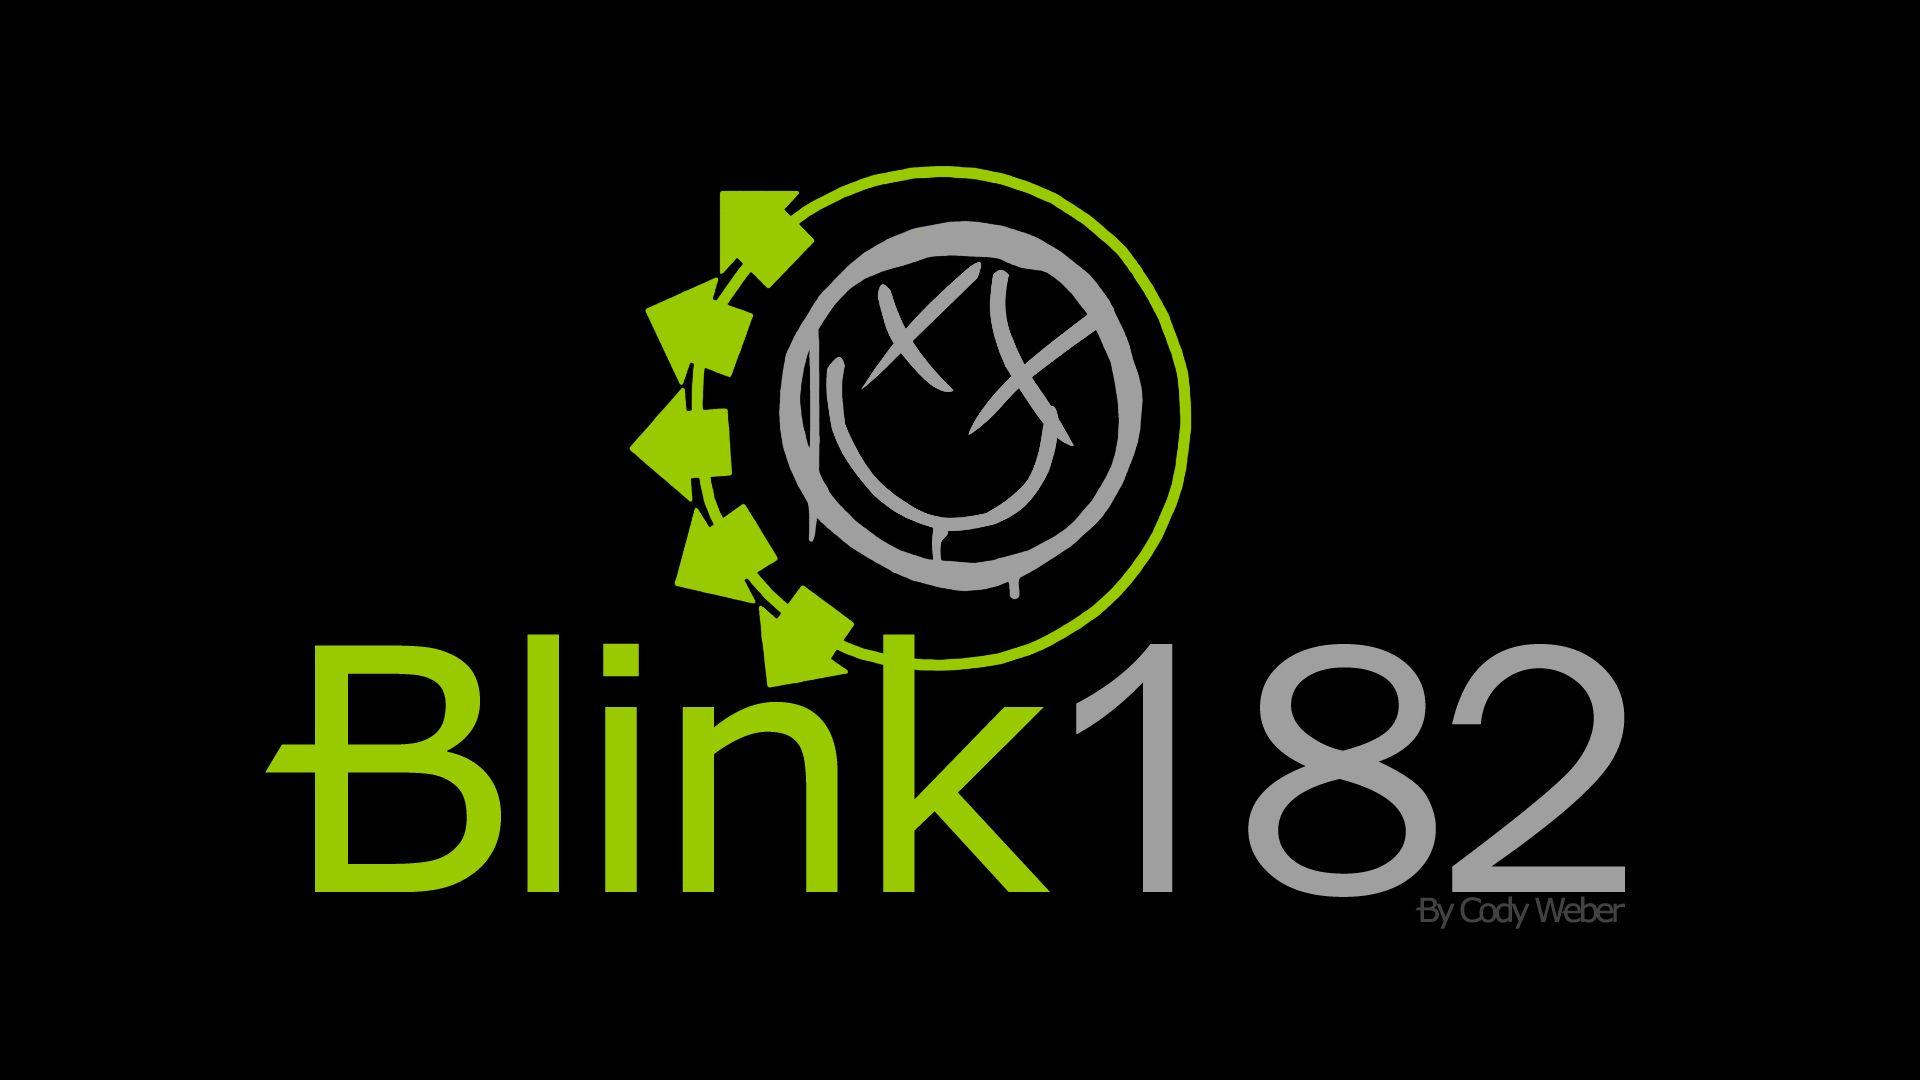 Blink 182 Logo Wallpaper Download HD Wallpapers Widescreen